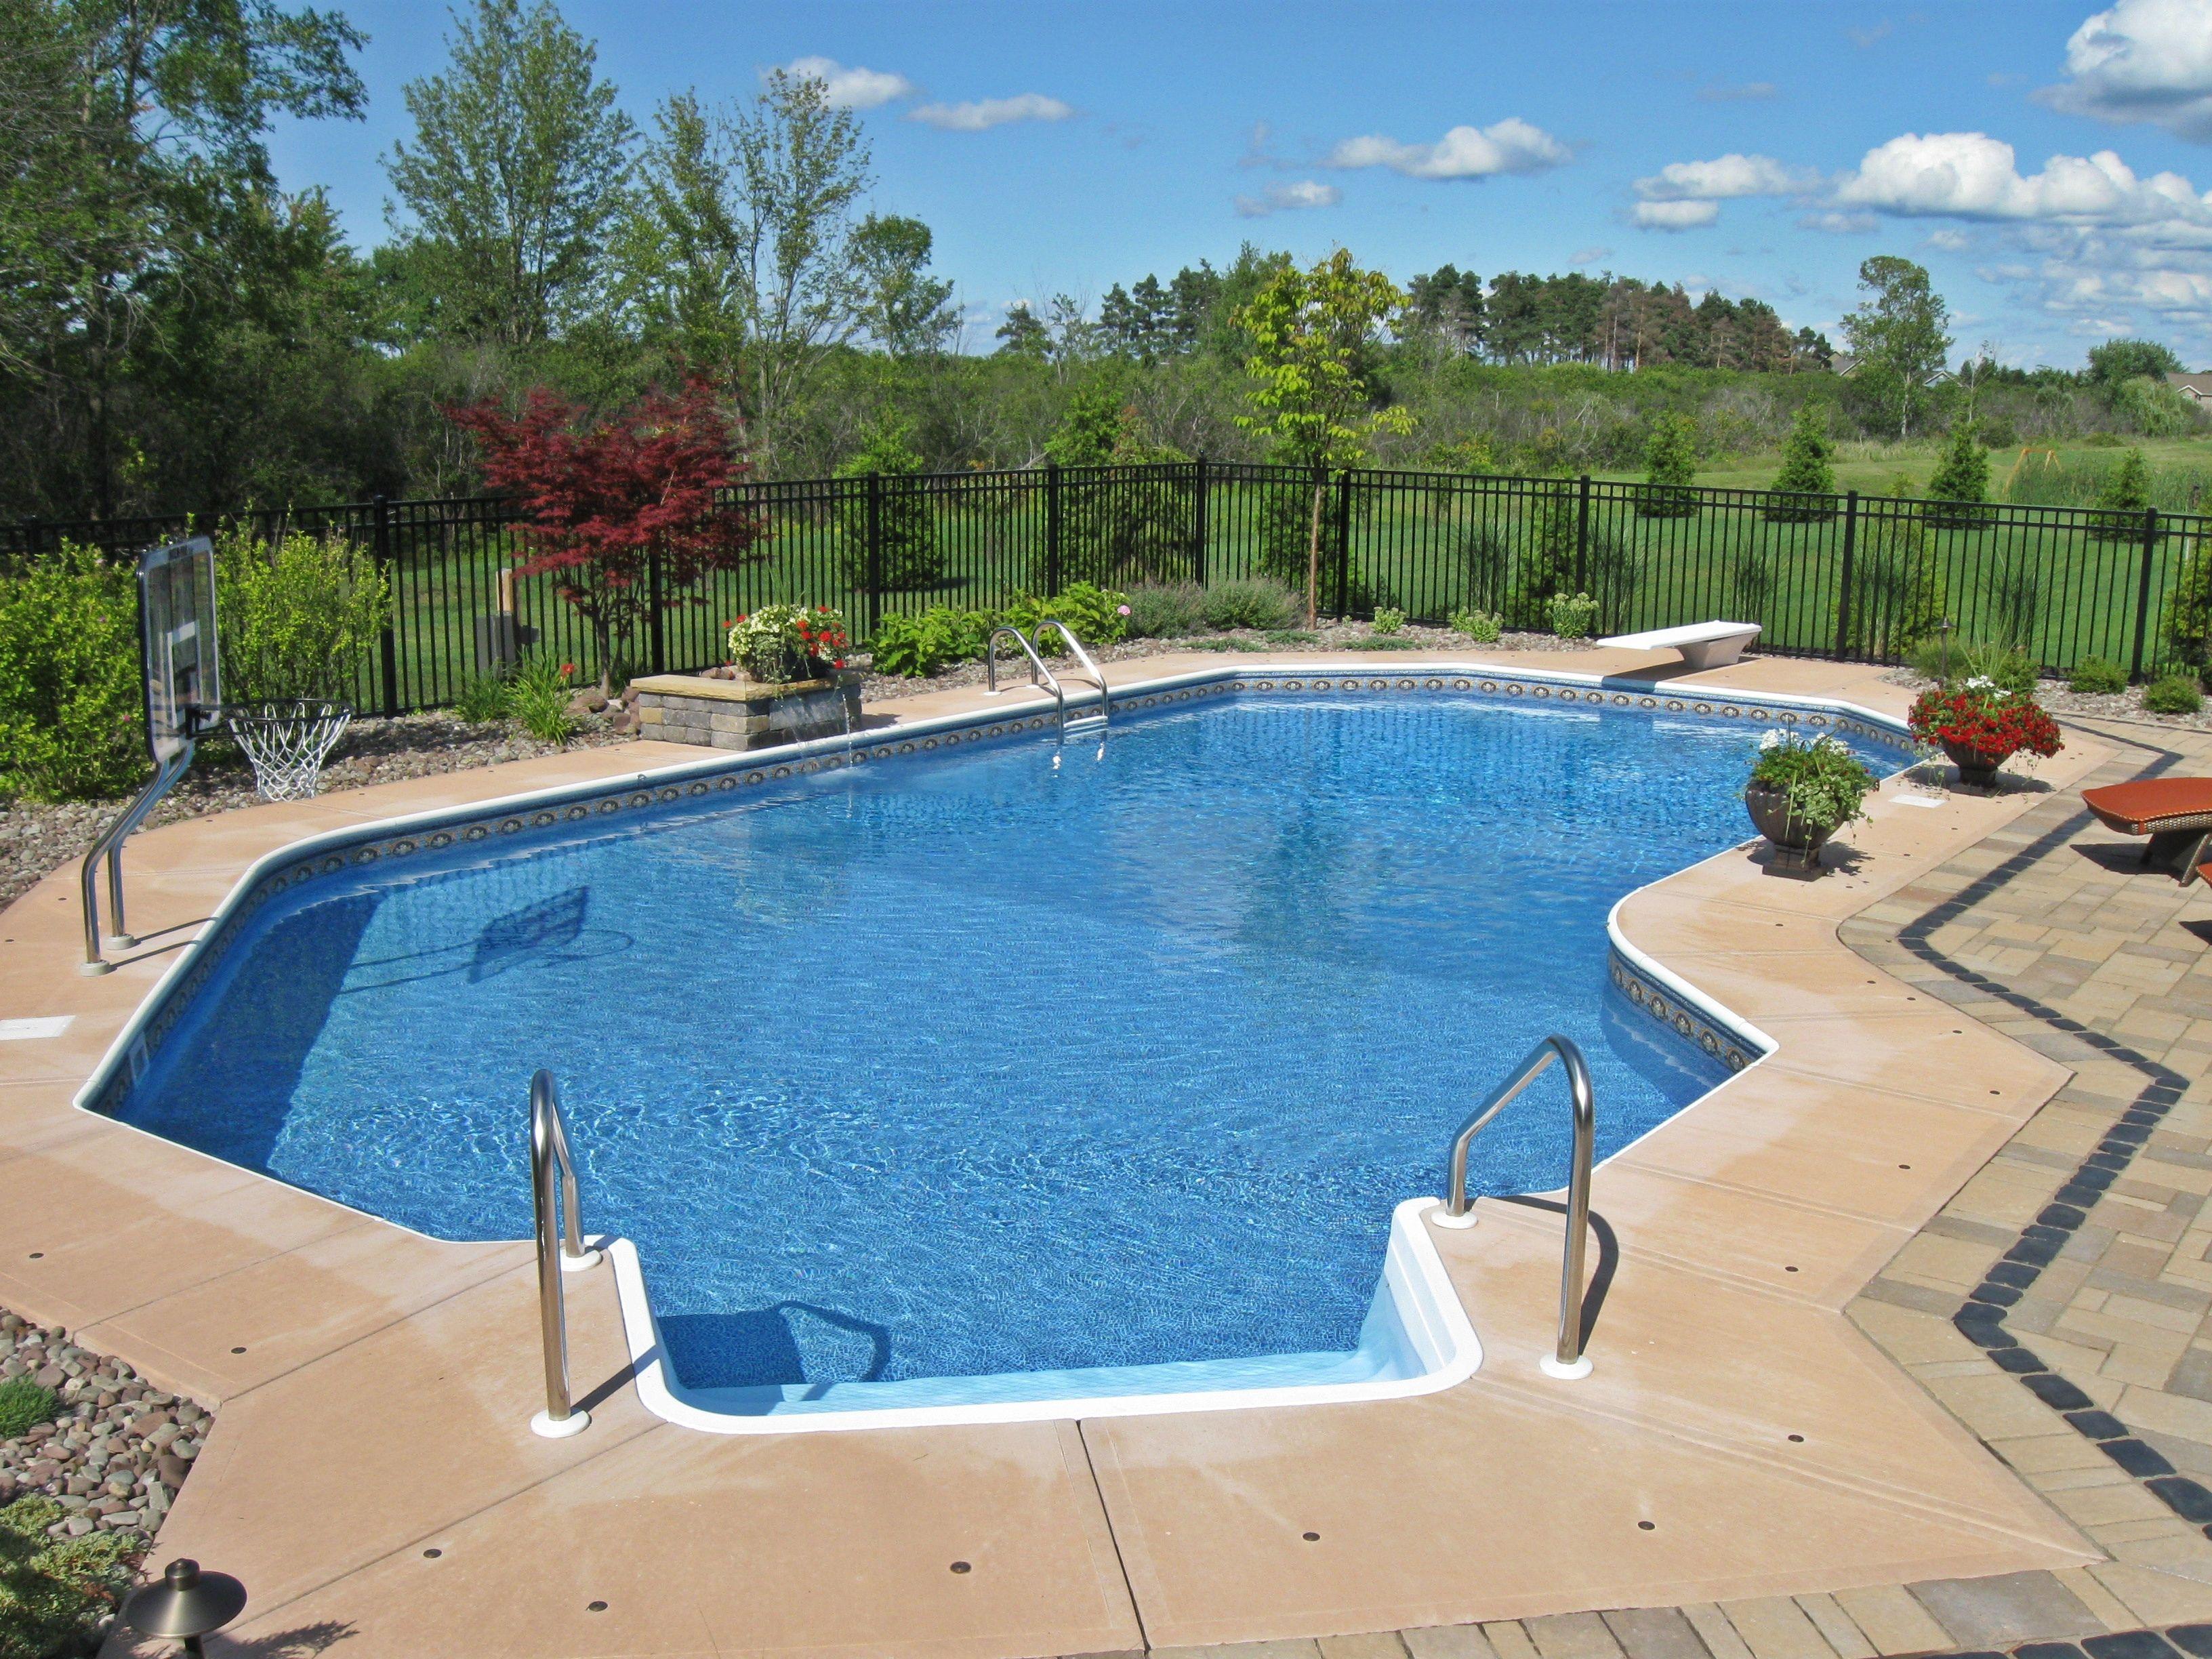 Grecian Lazy L Camillus Pool Houses Swimming Pools Pool